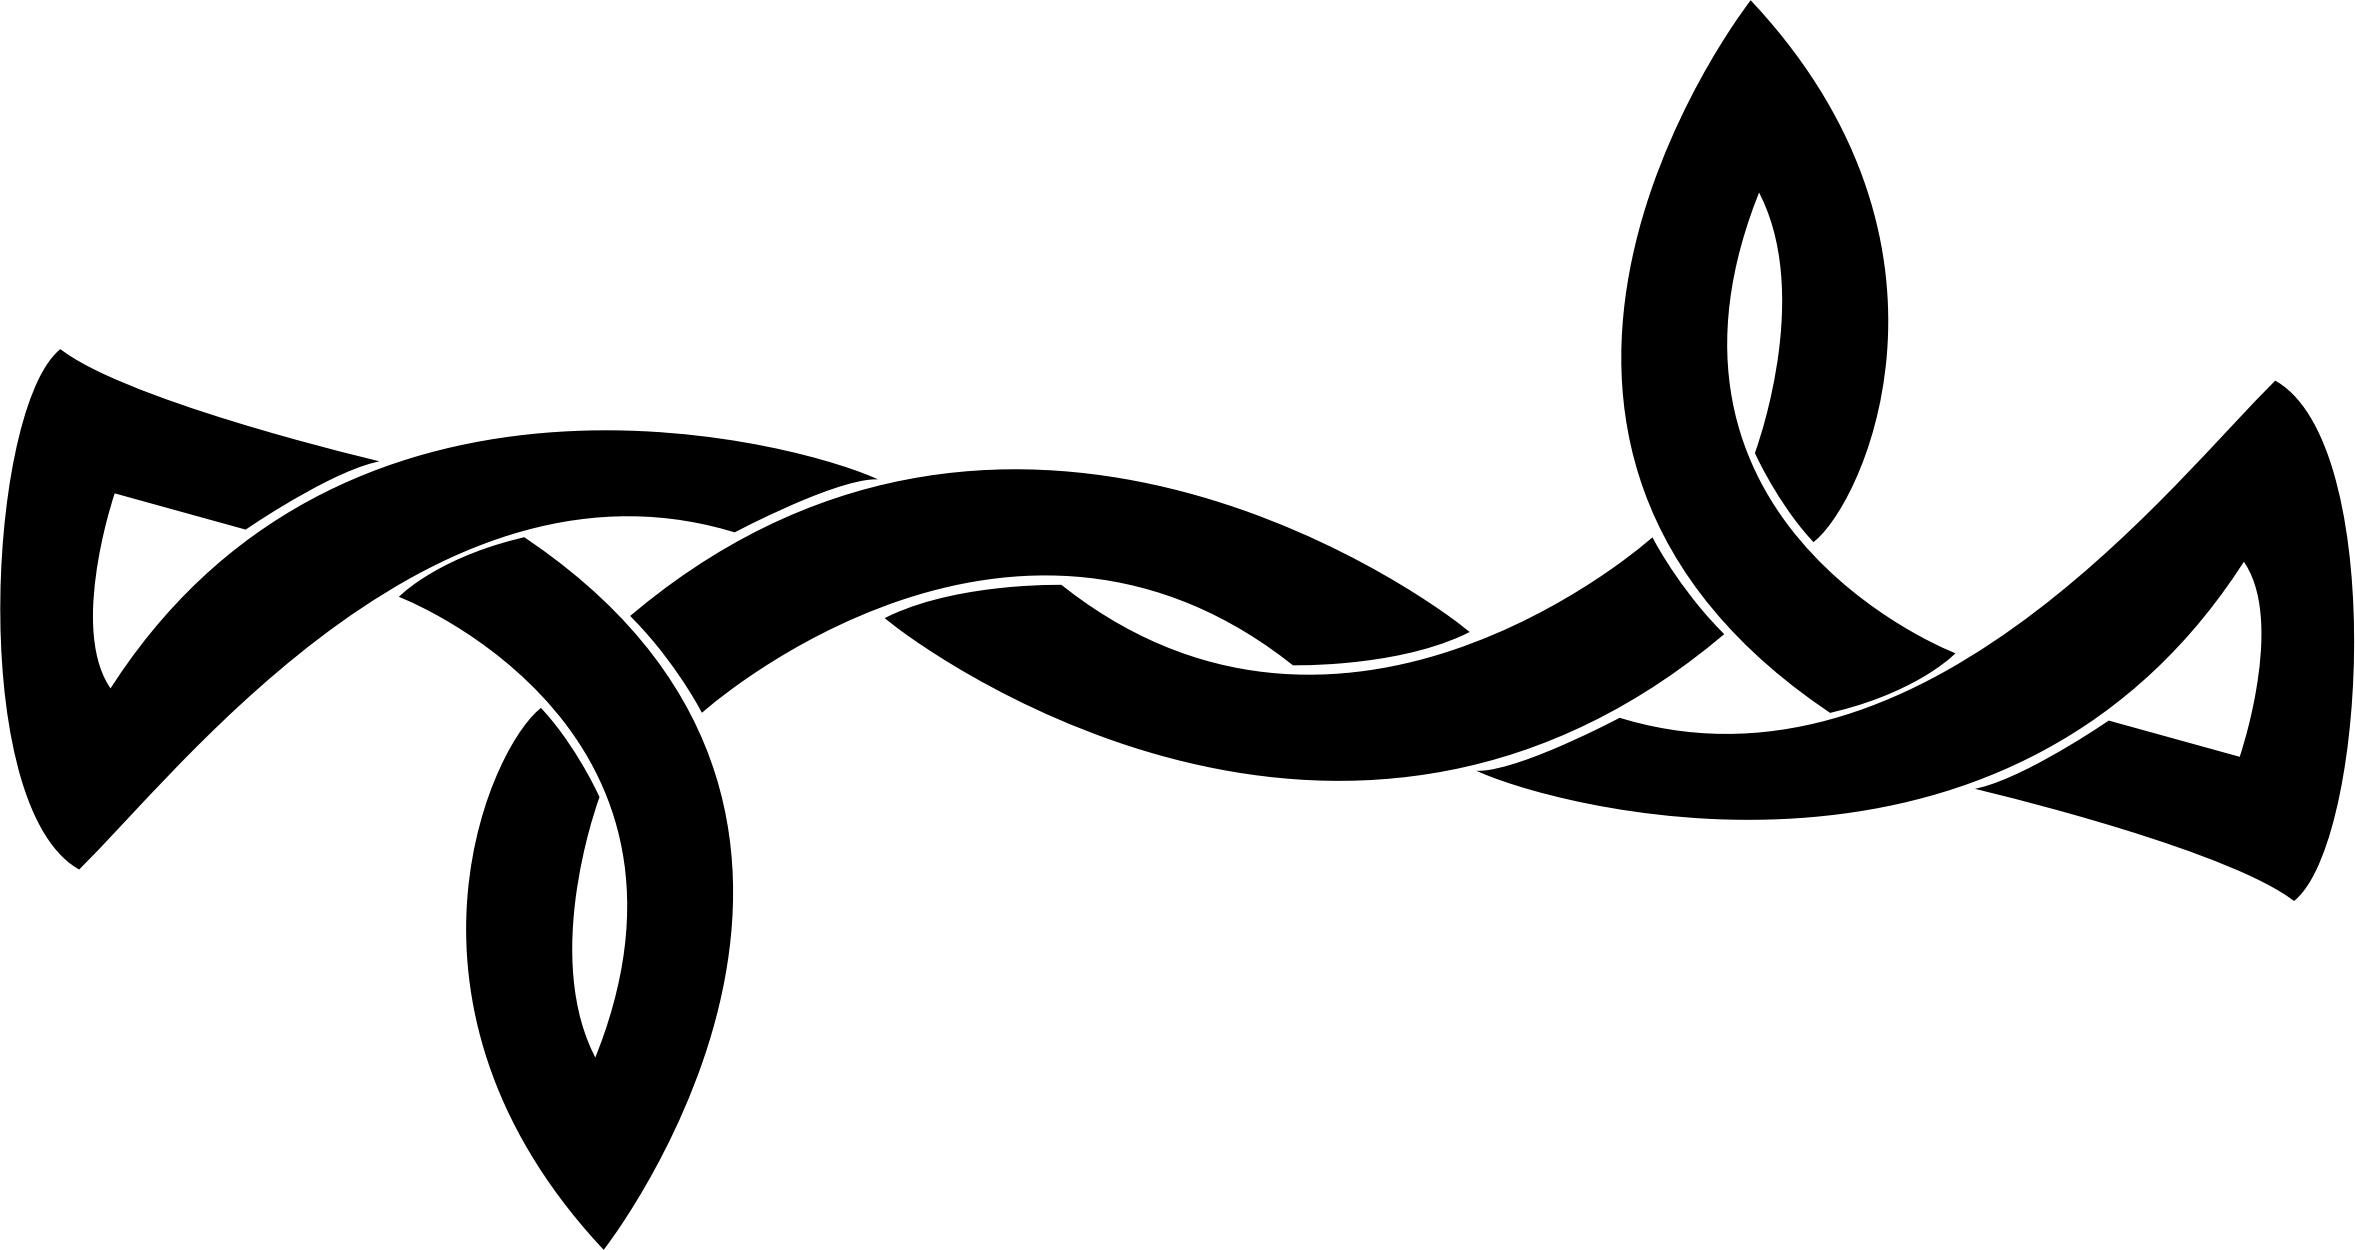 Celtic Knot PNG - 4200